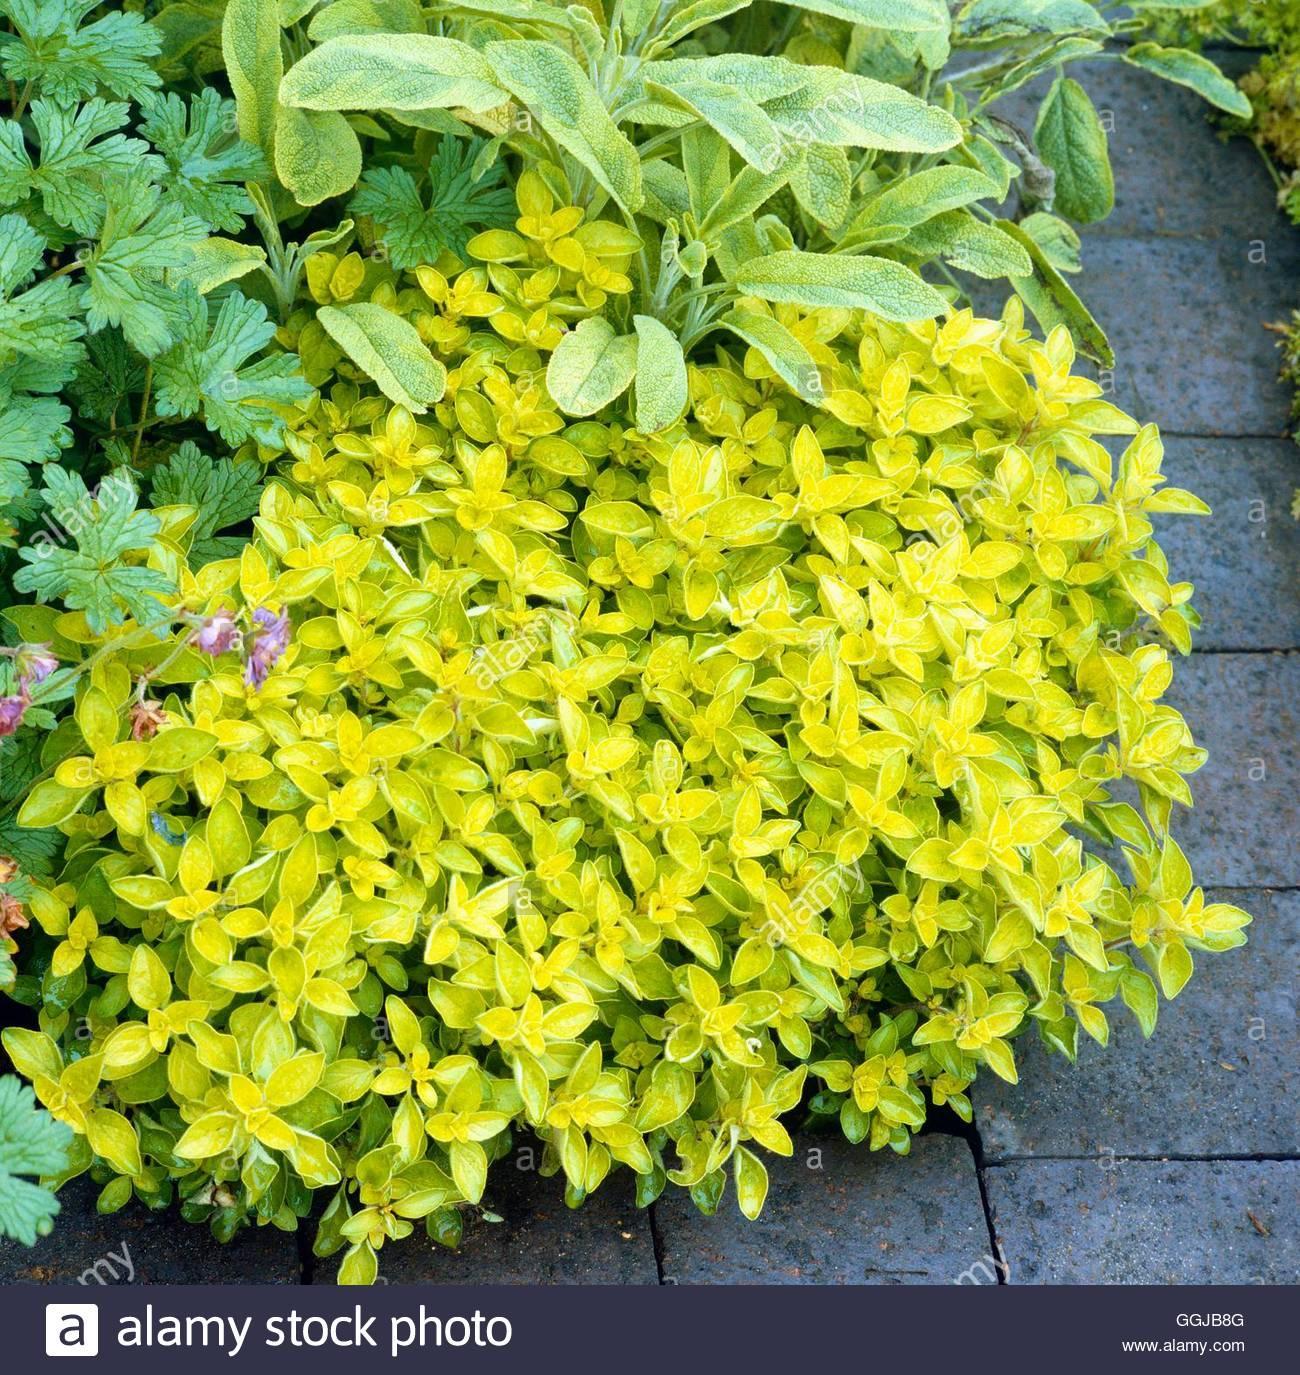 Bylinka - oregáno - aureum, žltozlaté listy, bledo ružové kvety - Obrázok č. 1